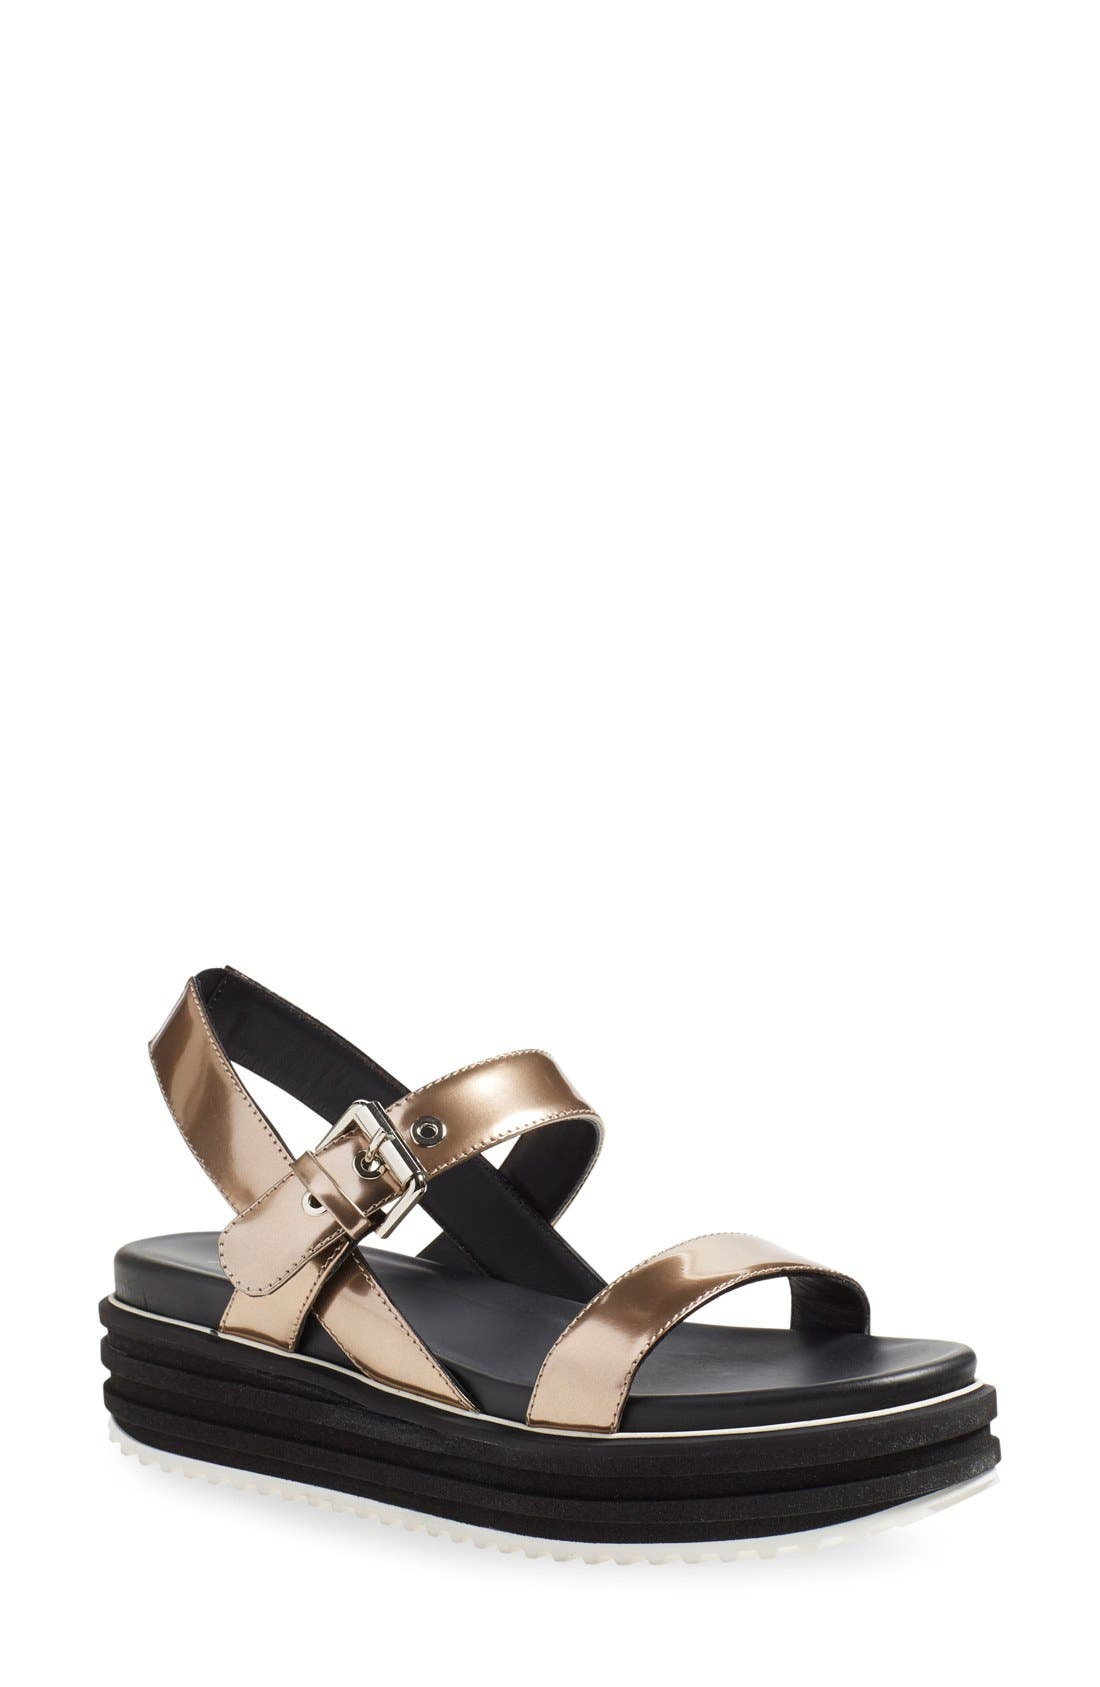 Main Image - Aquatalia 'Wanette' Sandal (Women)